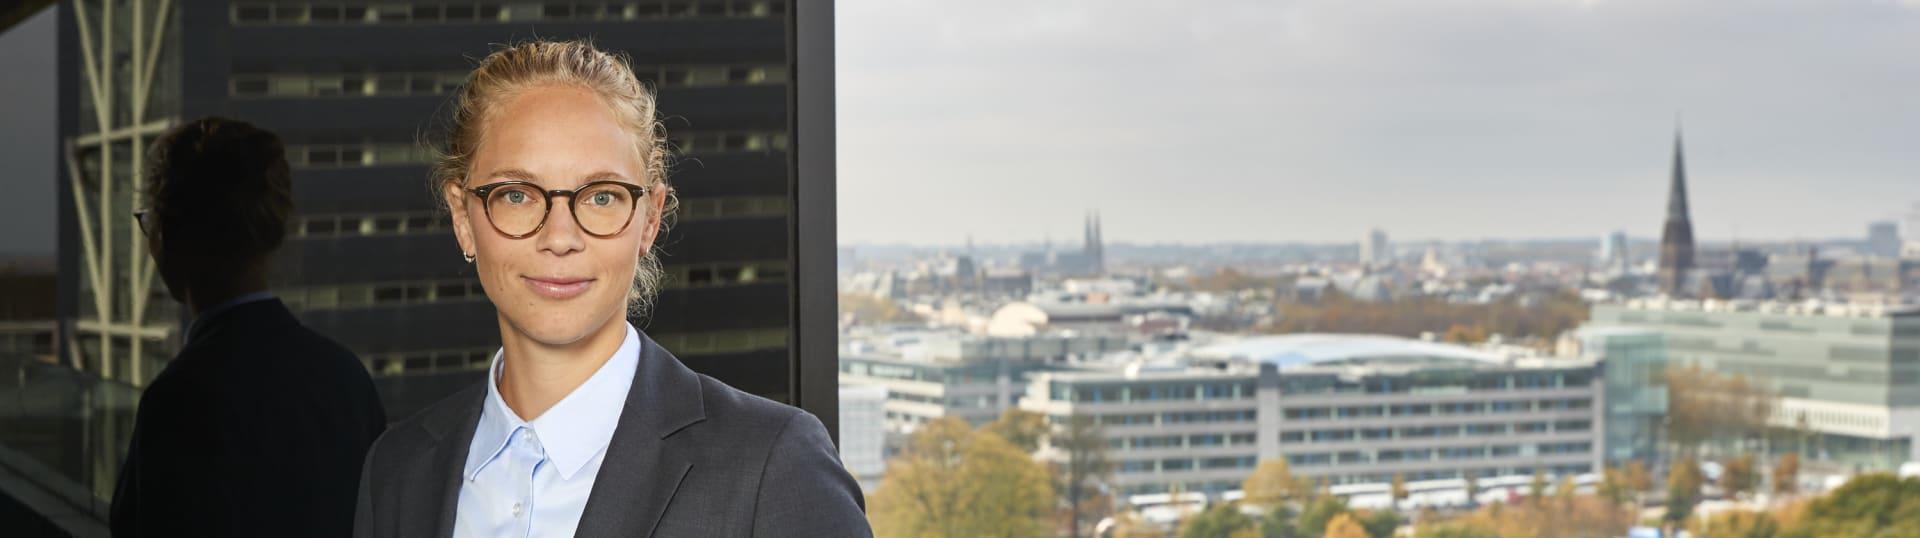 Milou Procé, advocaat Pels Rijcken